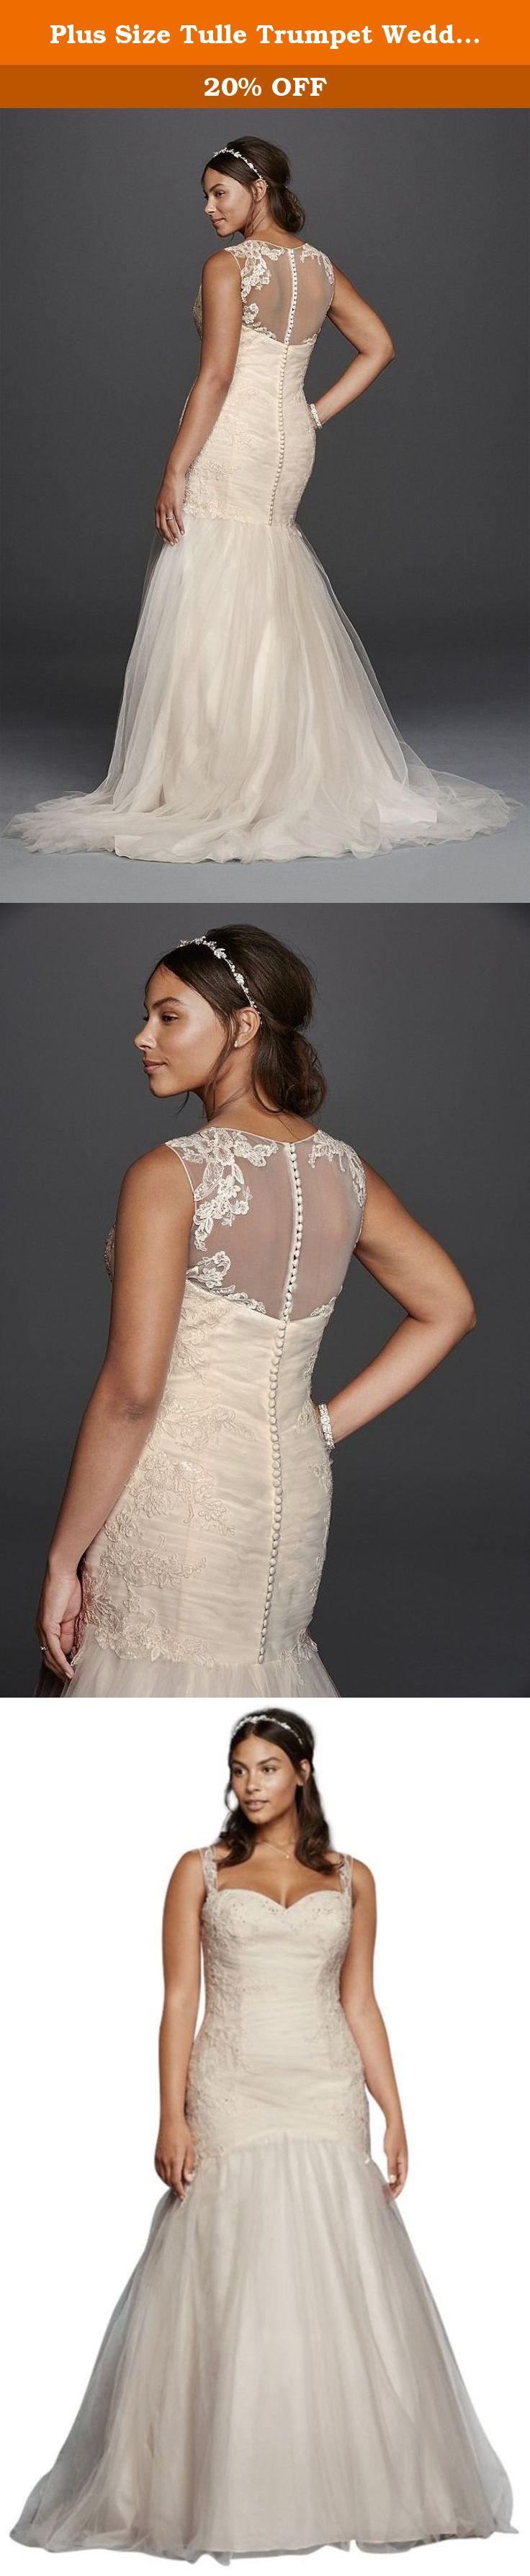 Plus size tulle wedding dress  Plus Size Tulle Trumpet Wedding Dress Style WG Ivory W